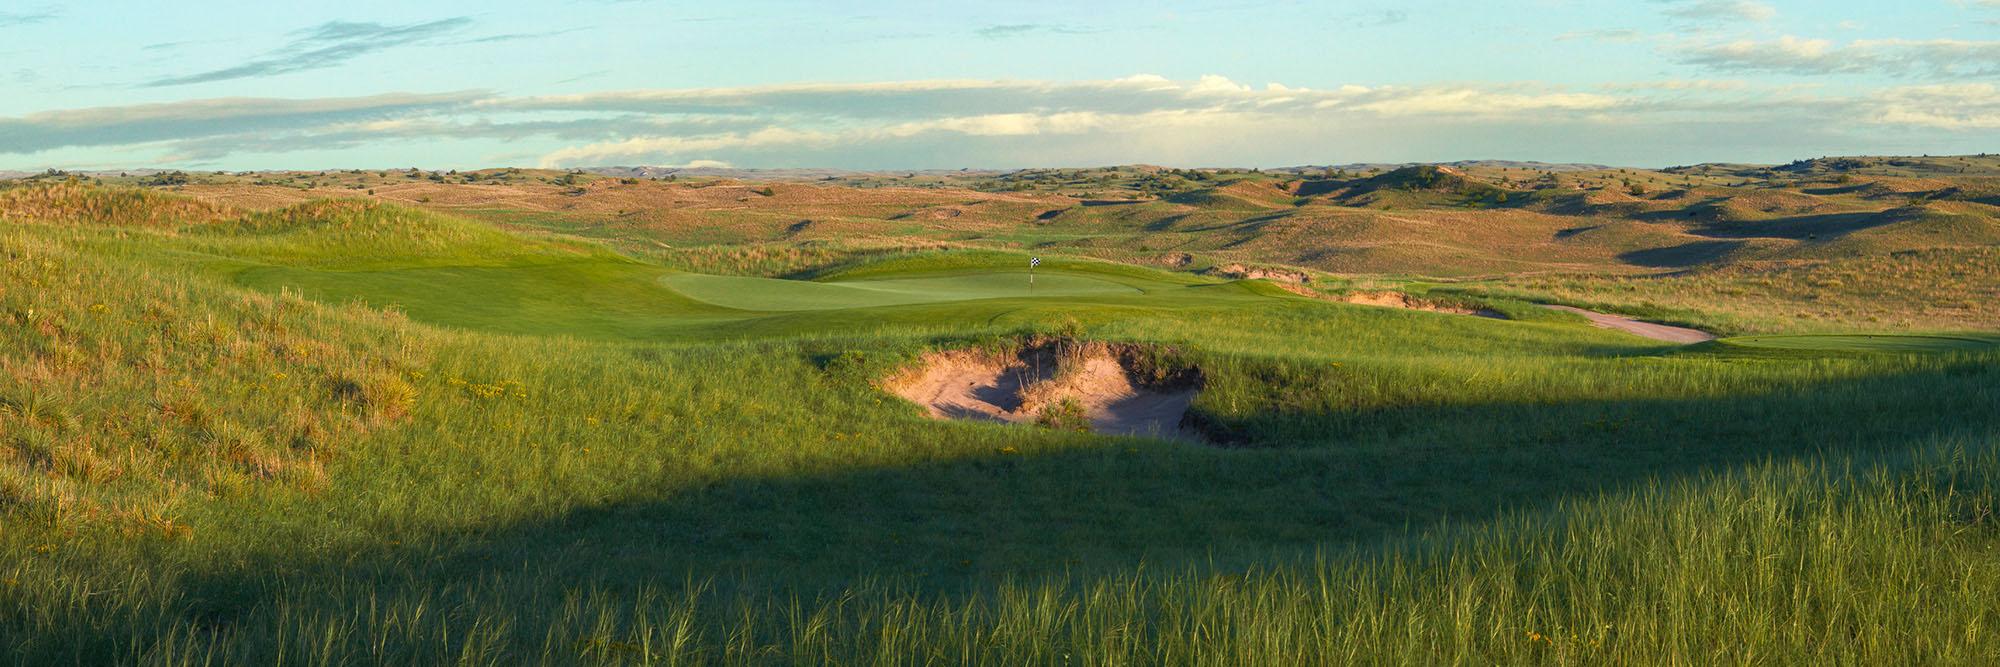 Golf Course Image - Sand Hills No. 3